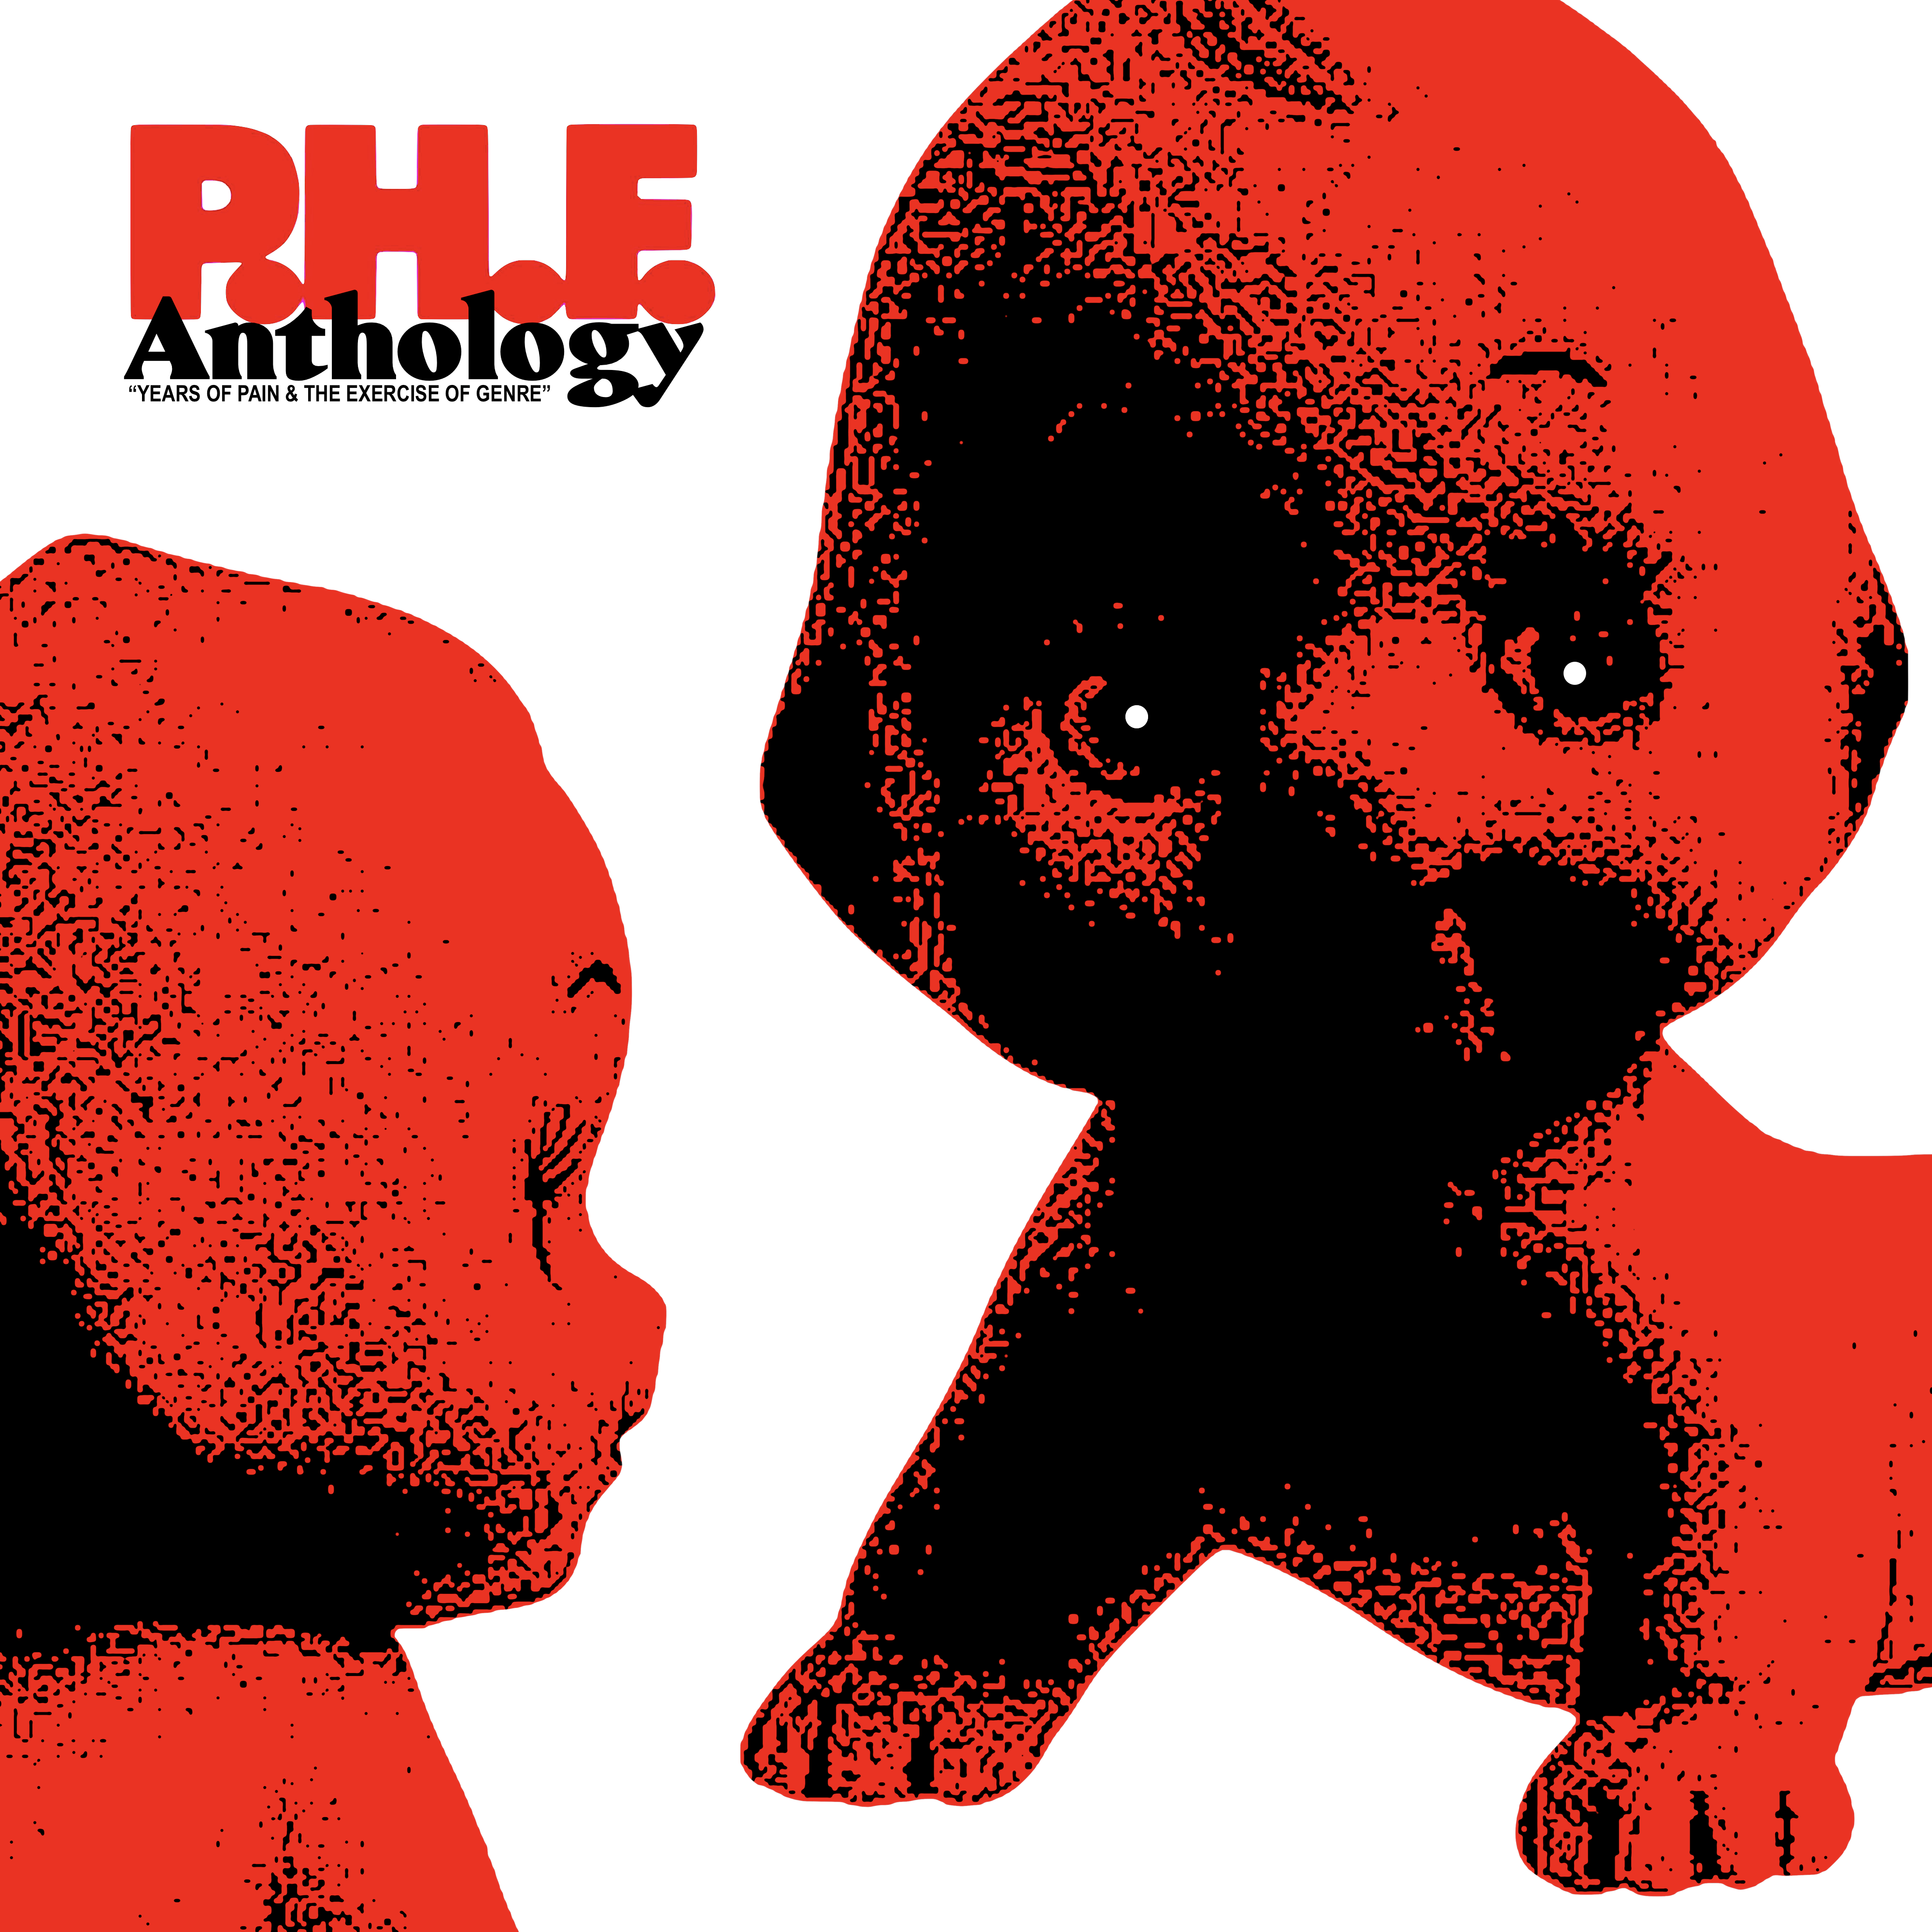 P.H.F. - Anthology (Tour Shirts Just Added)